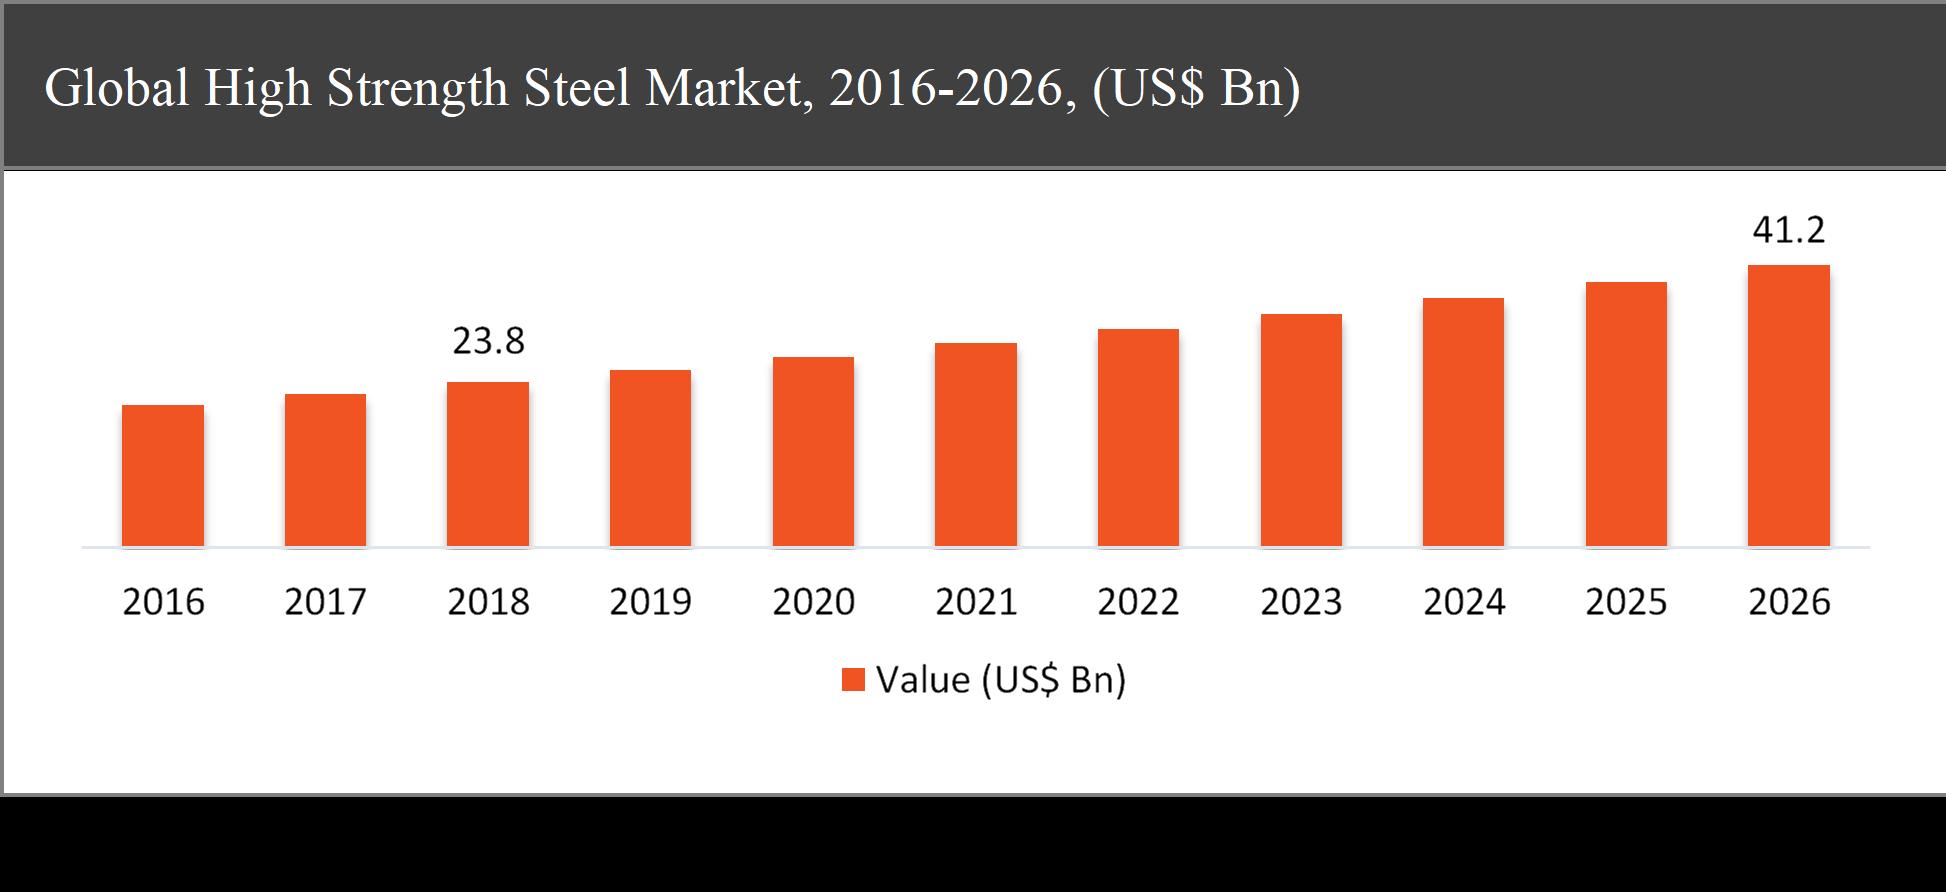 High Strength Steel Market